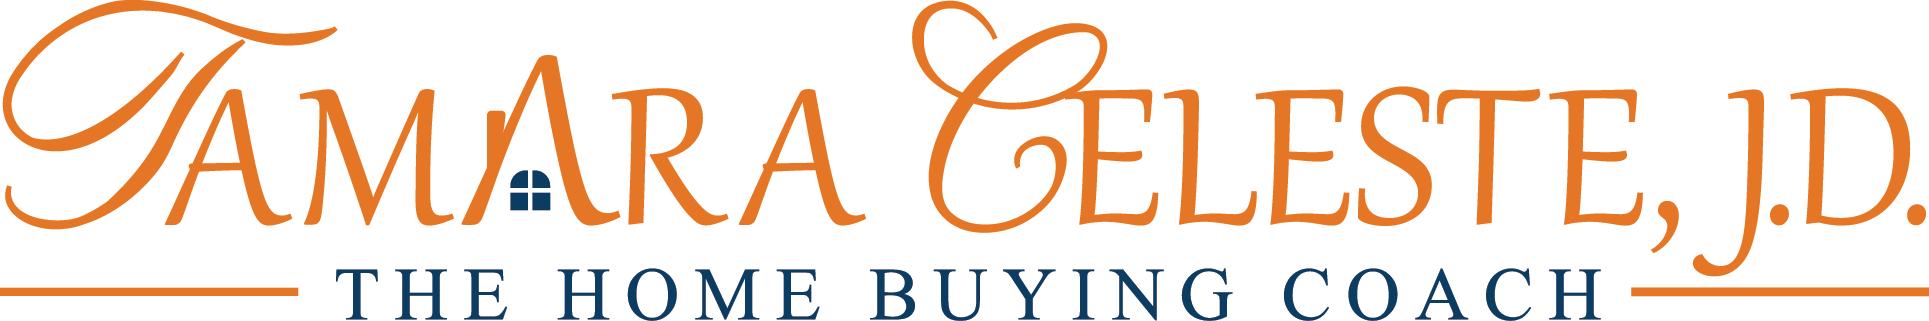 Tamara Celeste, J.C. Logo Large